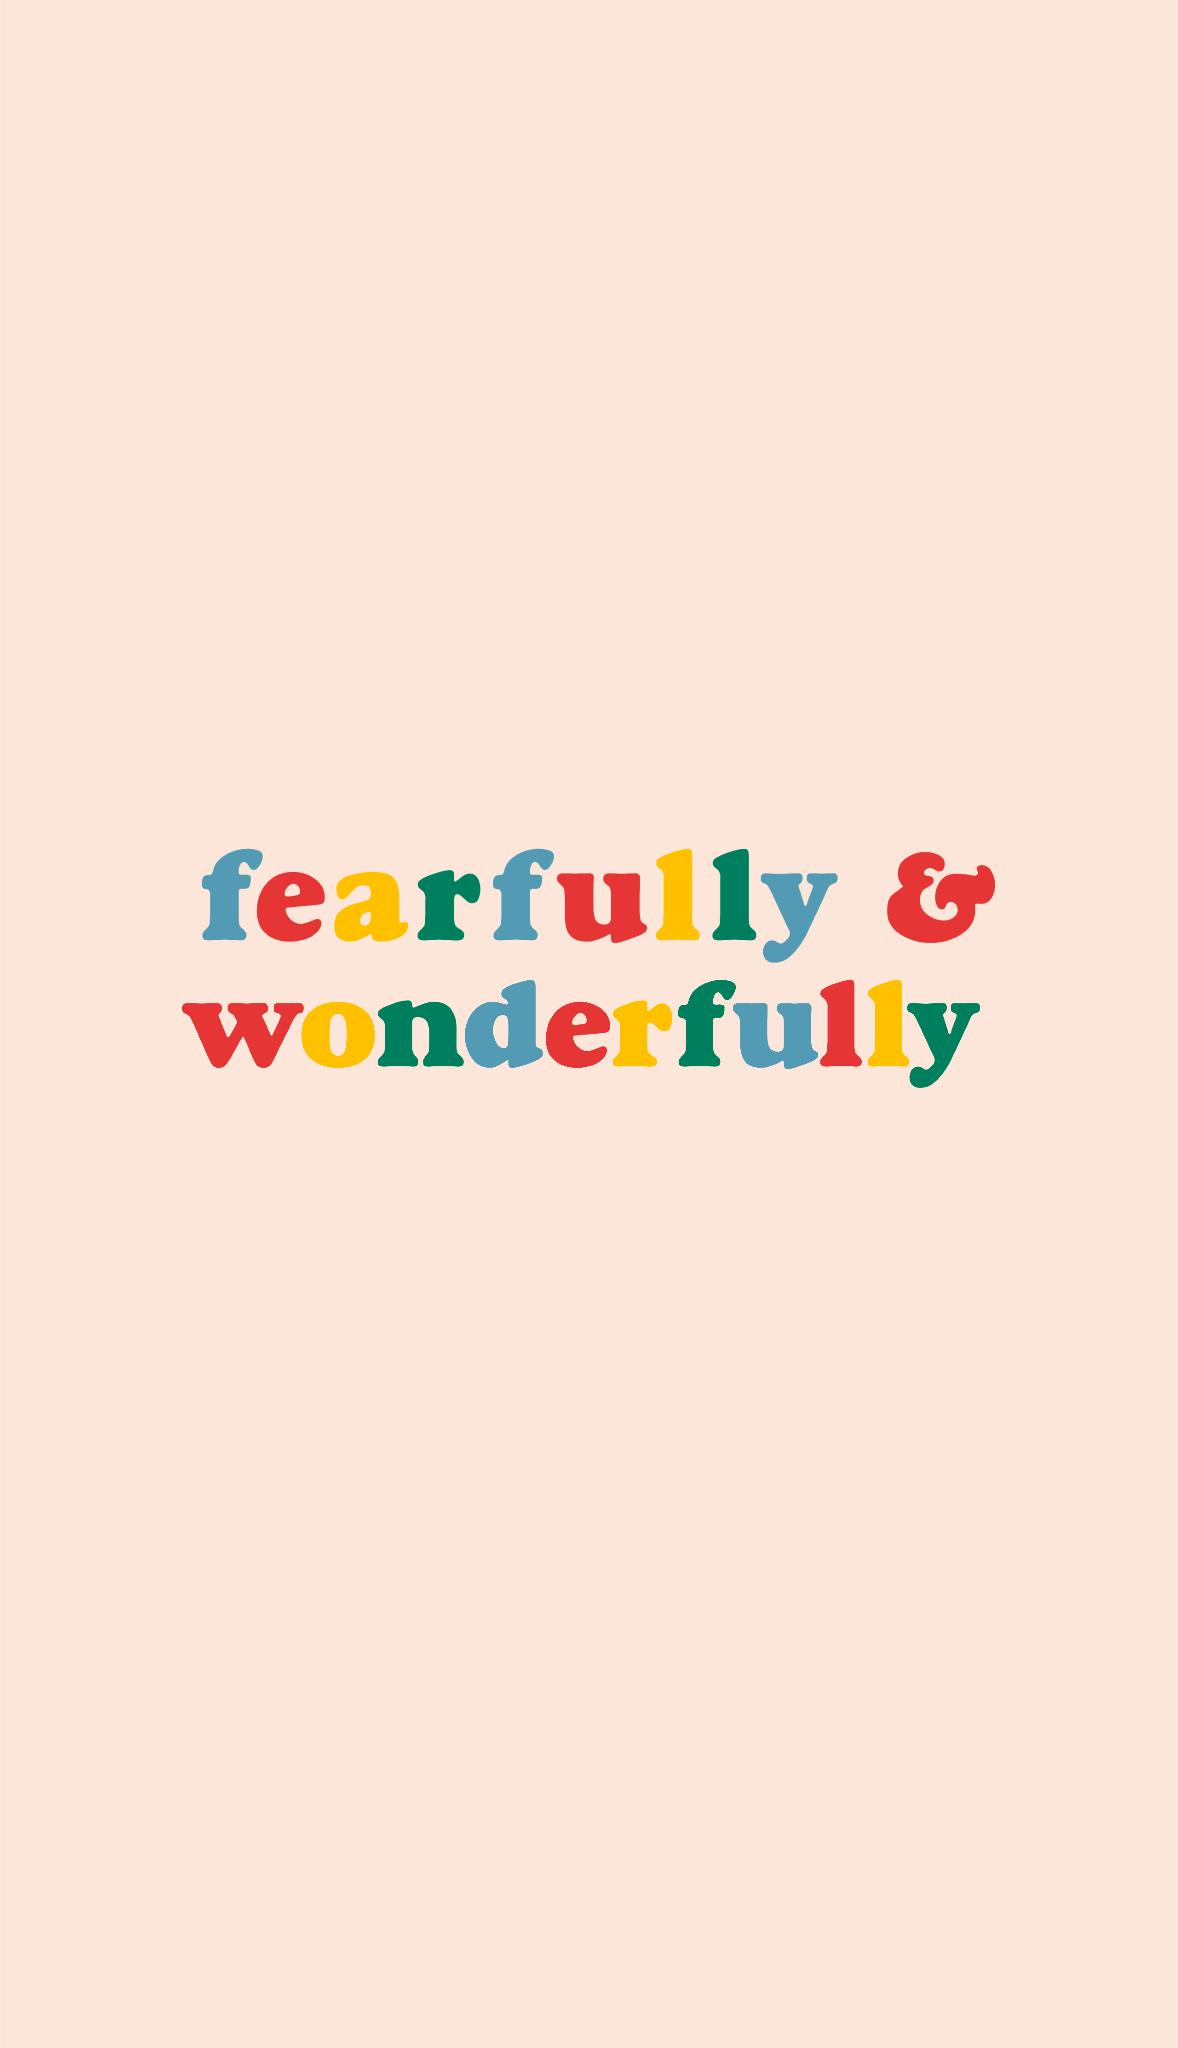 Psalm 138:14. Redbubble.com/people/glowingly wallpaper ...